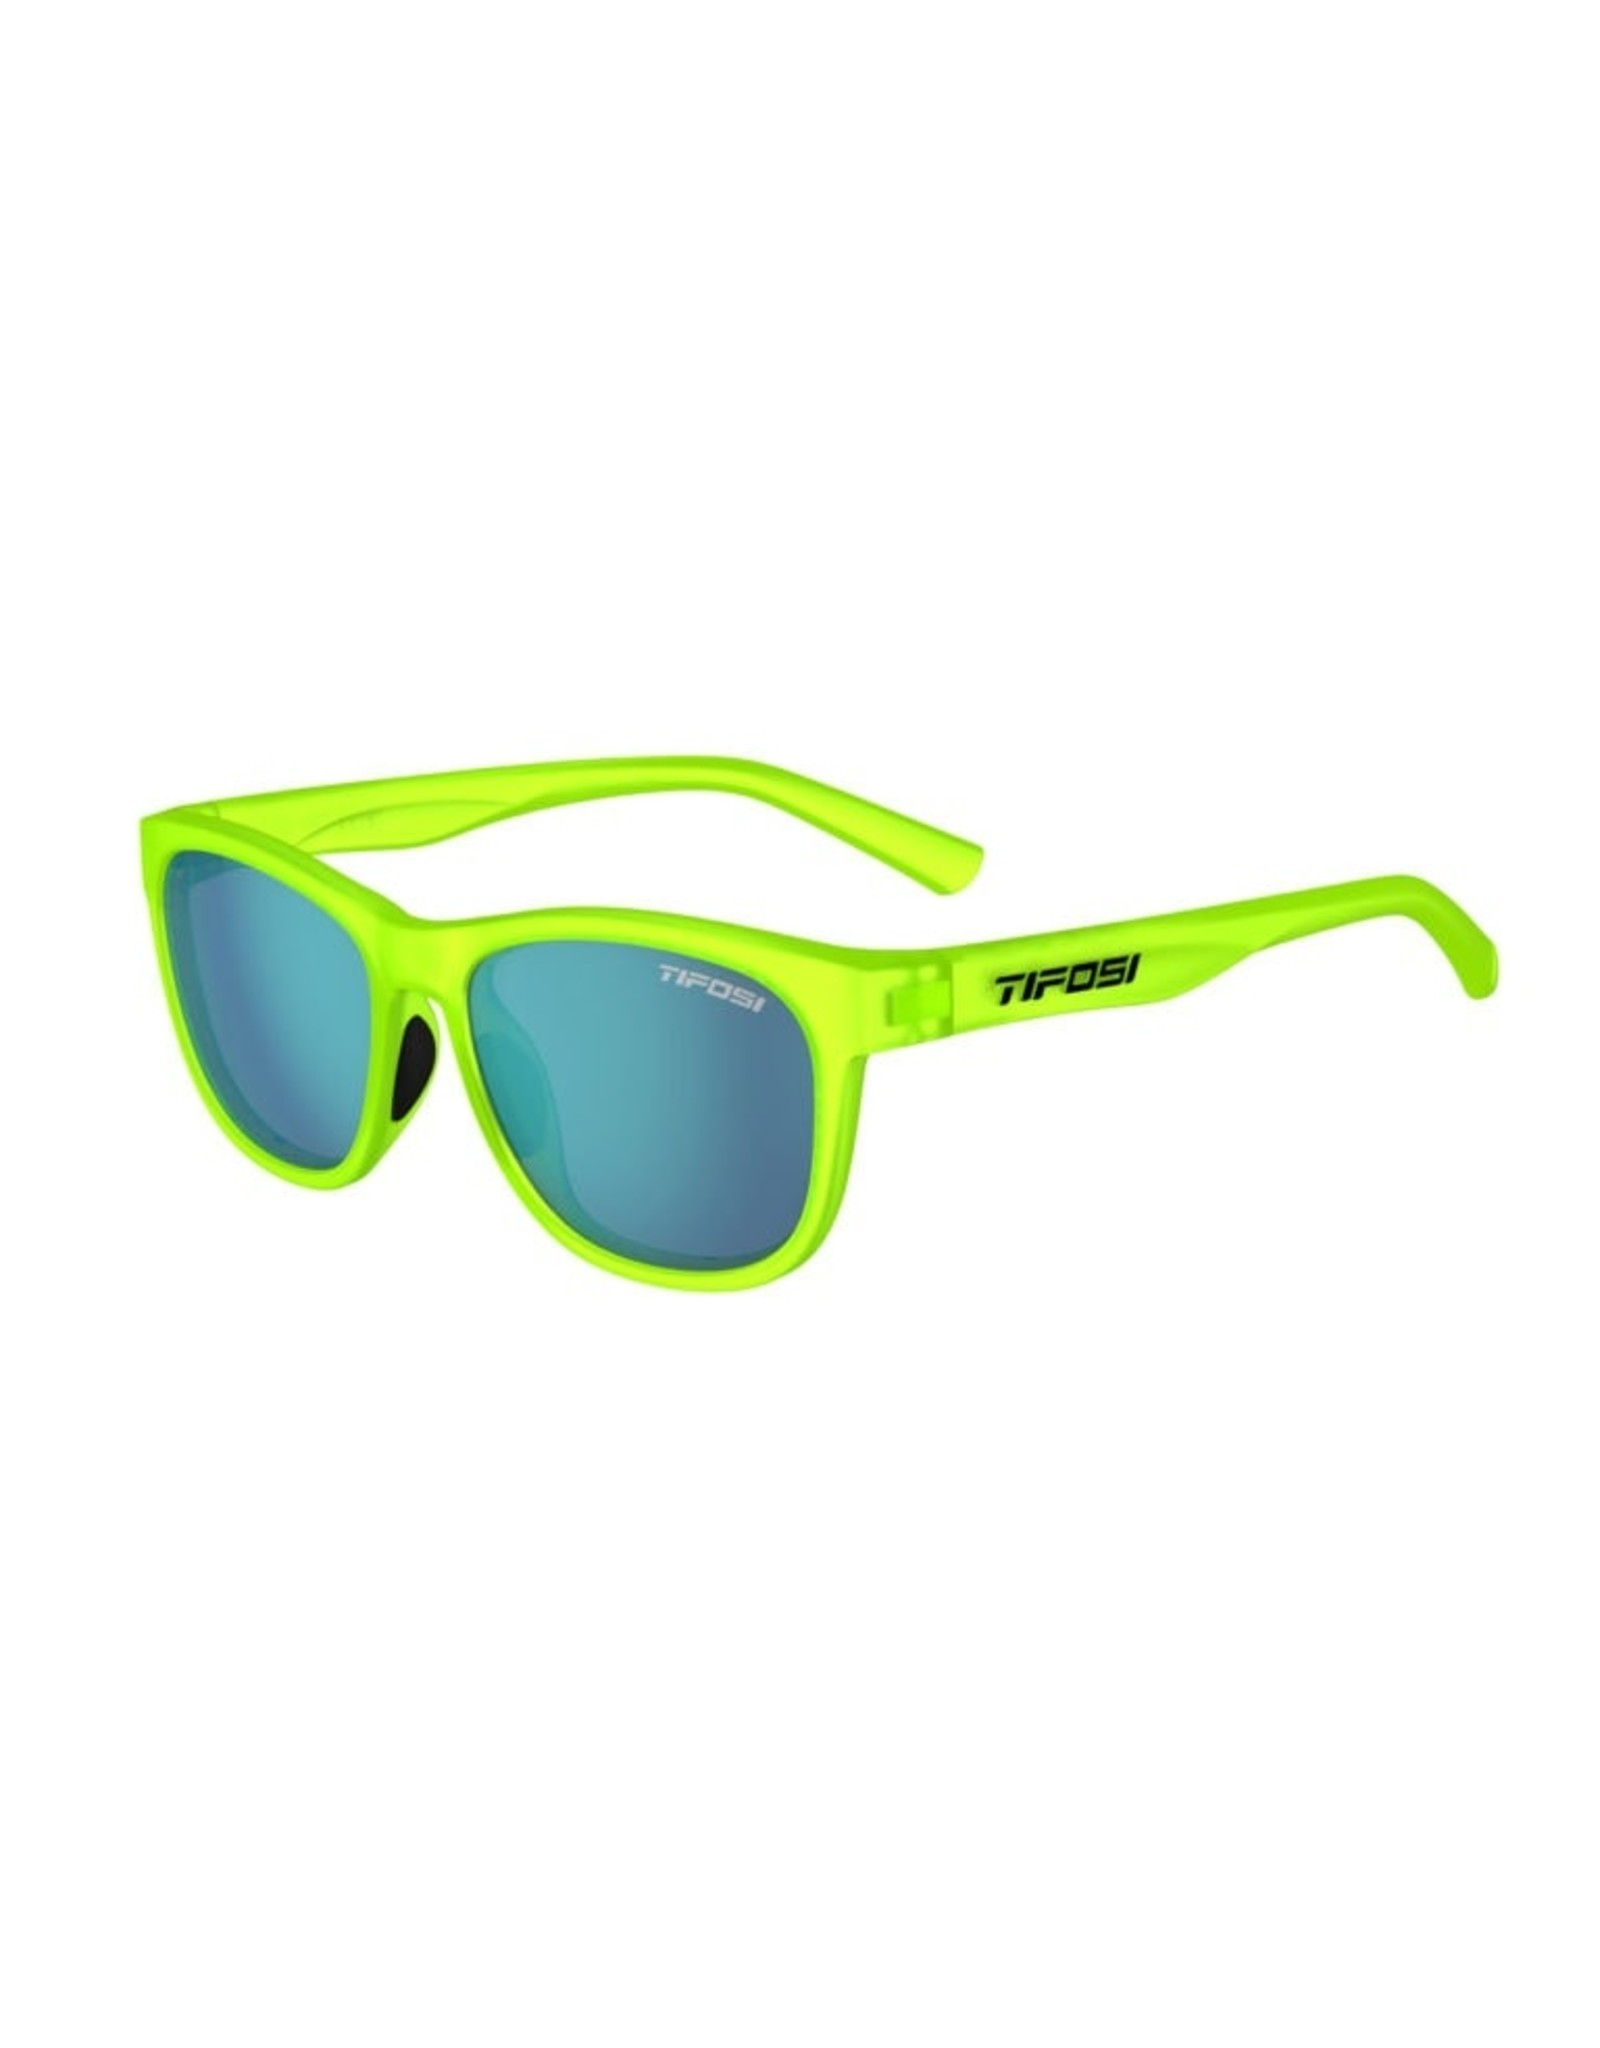 Tifosi Optics Swank, Satin Electric Green Single Lens Sunglasses - Smoke Bright Blue